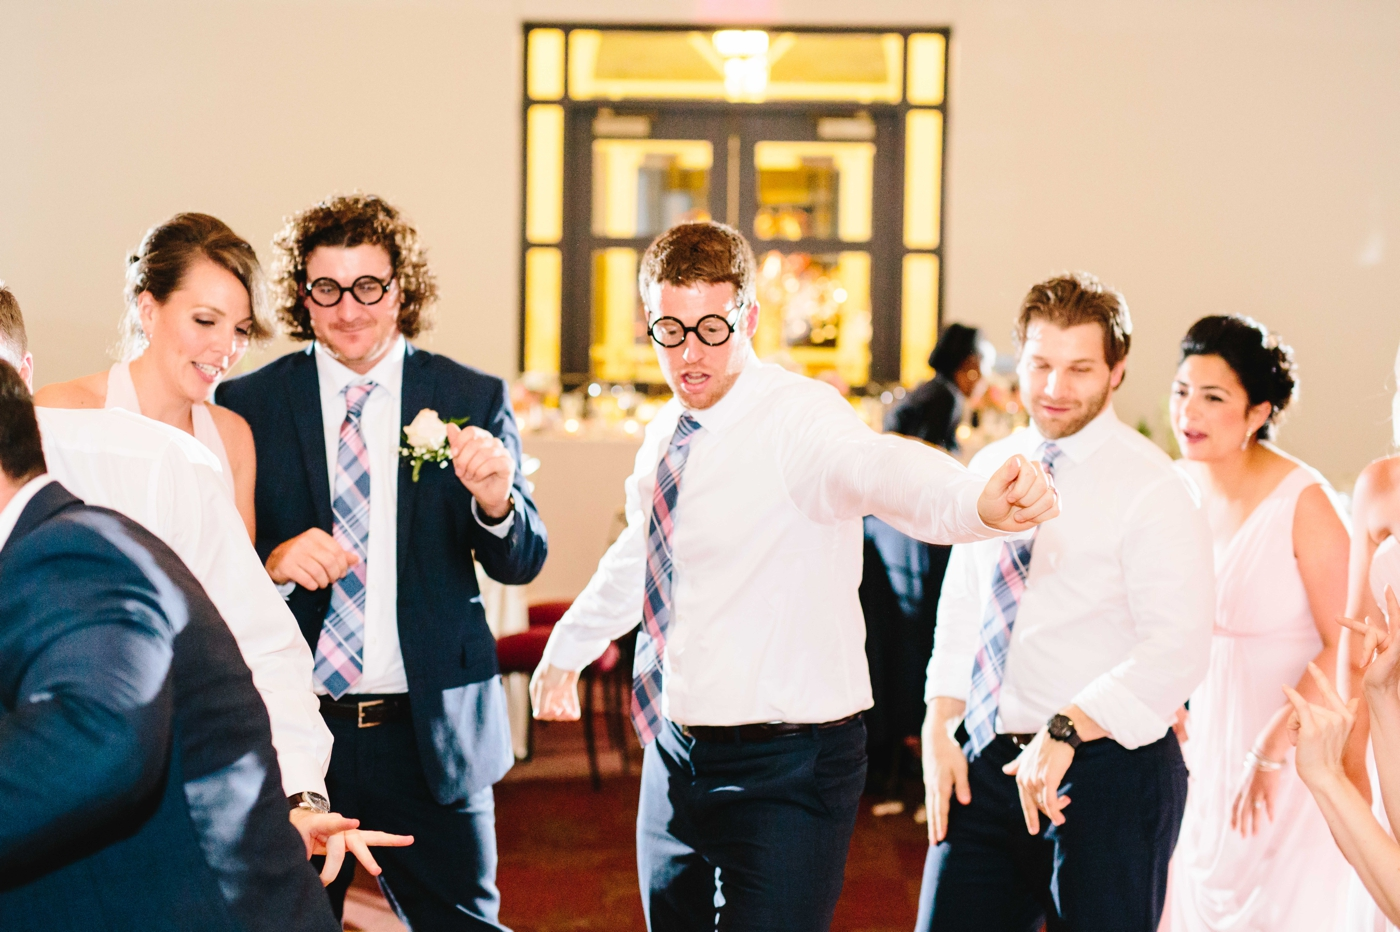 chicago-fine-art-wedding-photography-svihra27